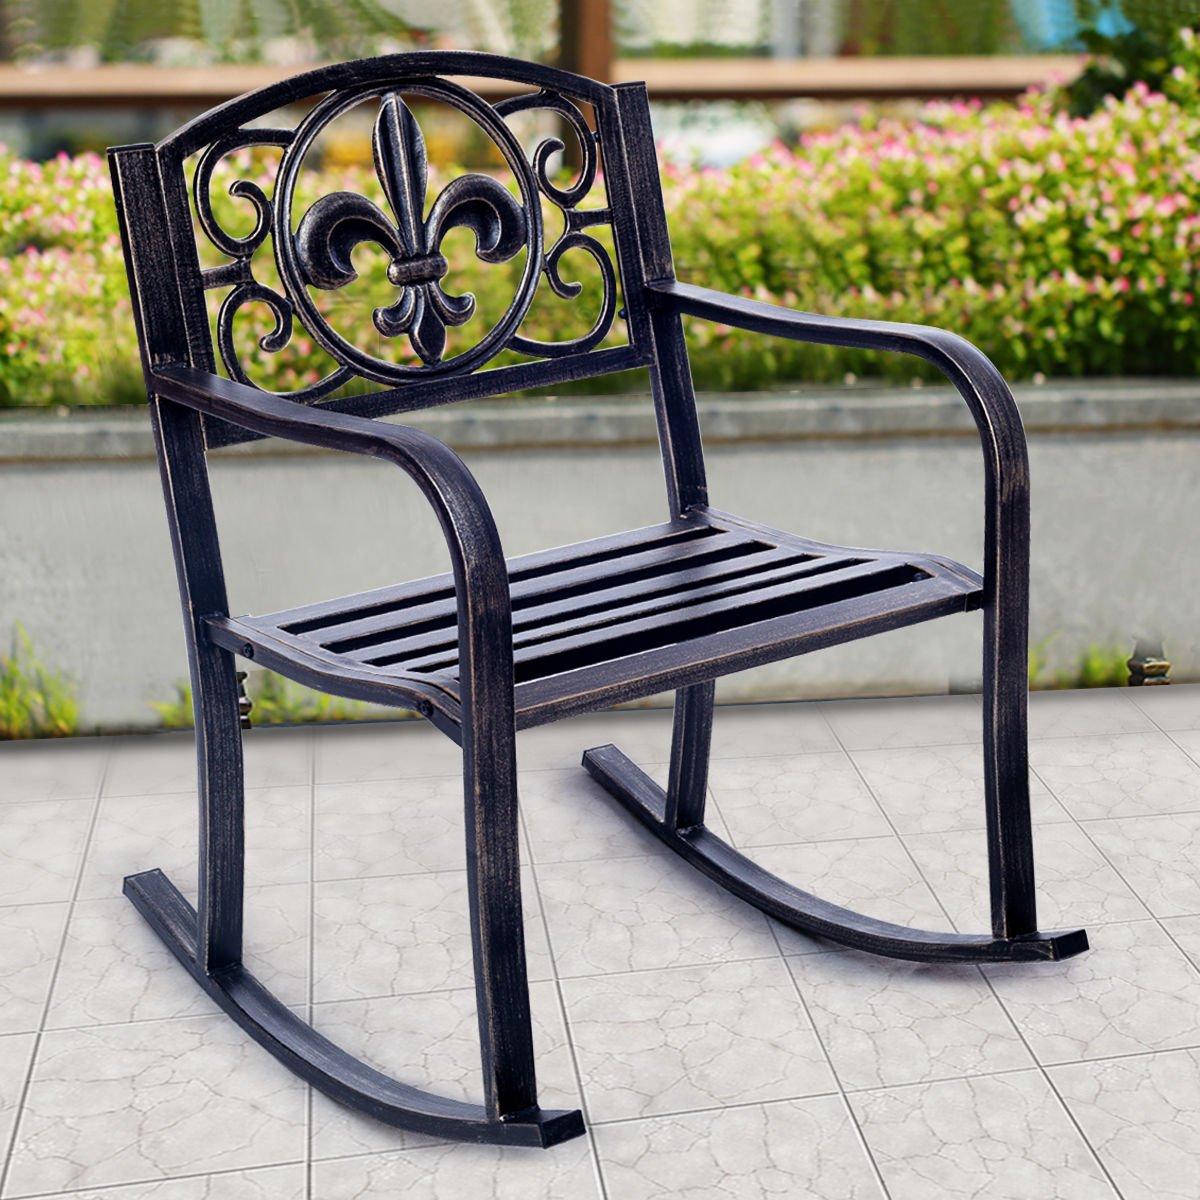 Amazon com patio metal rocking chair porch seat deck outdoor backyard glider rocker 28x24 garden outdoor